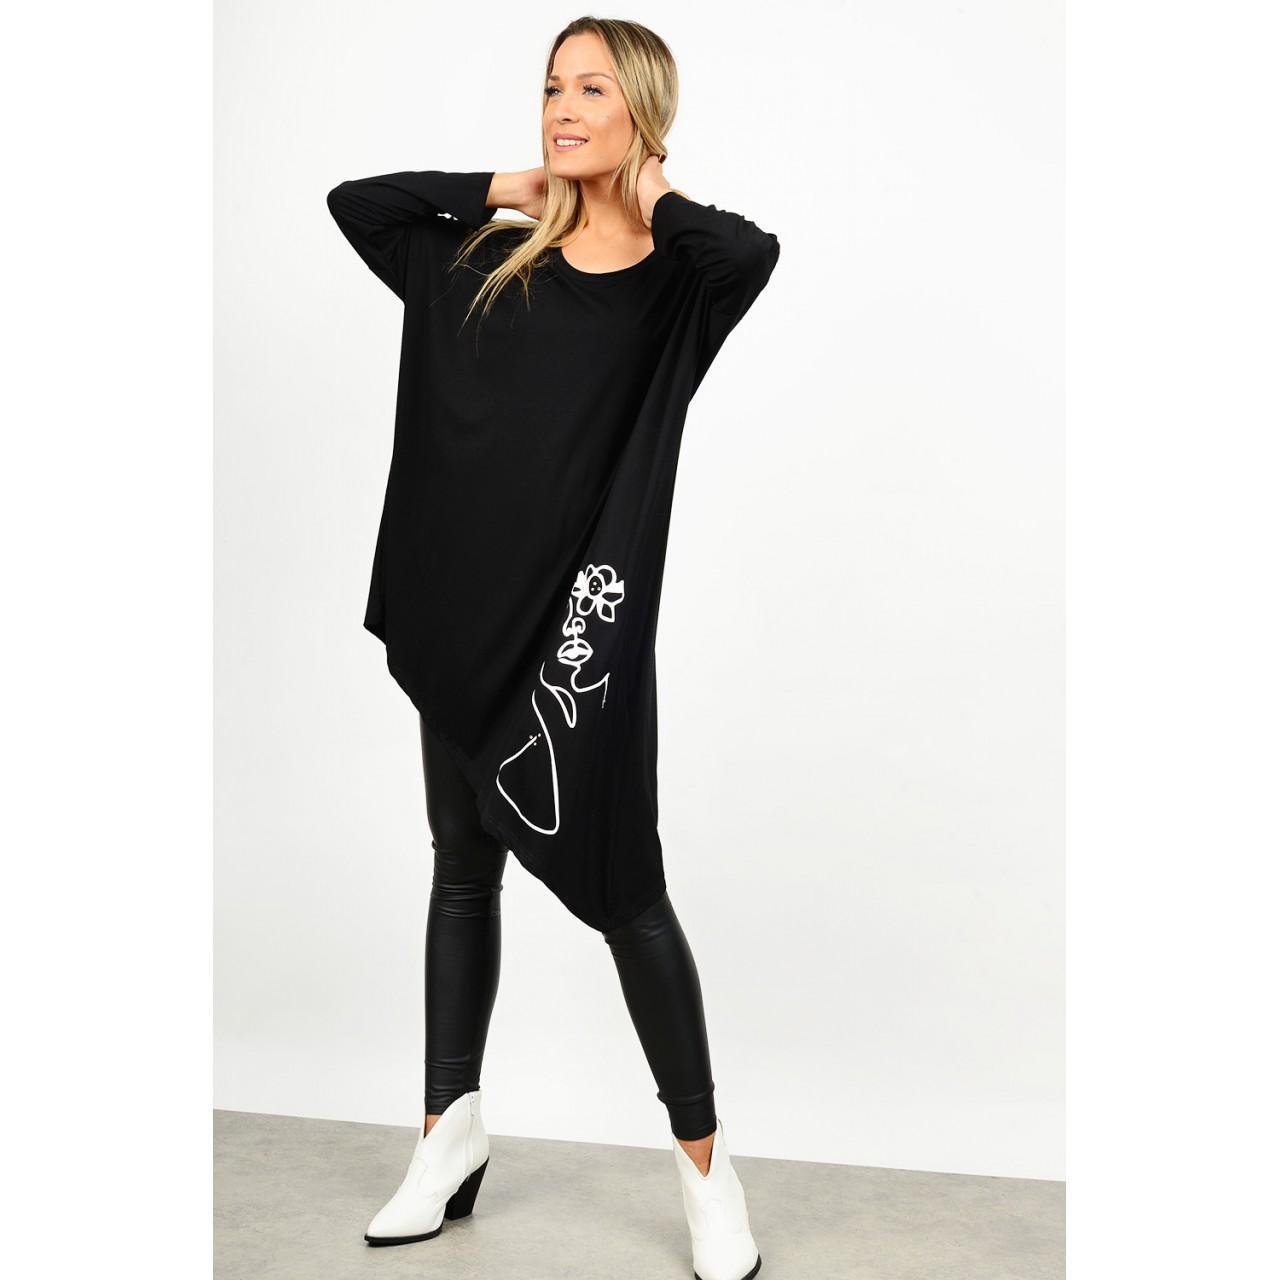 Oversized asymmetrical blouse/dress